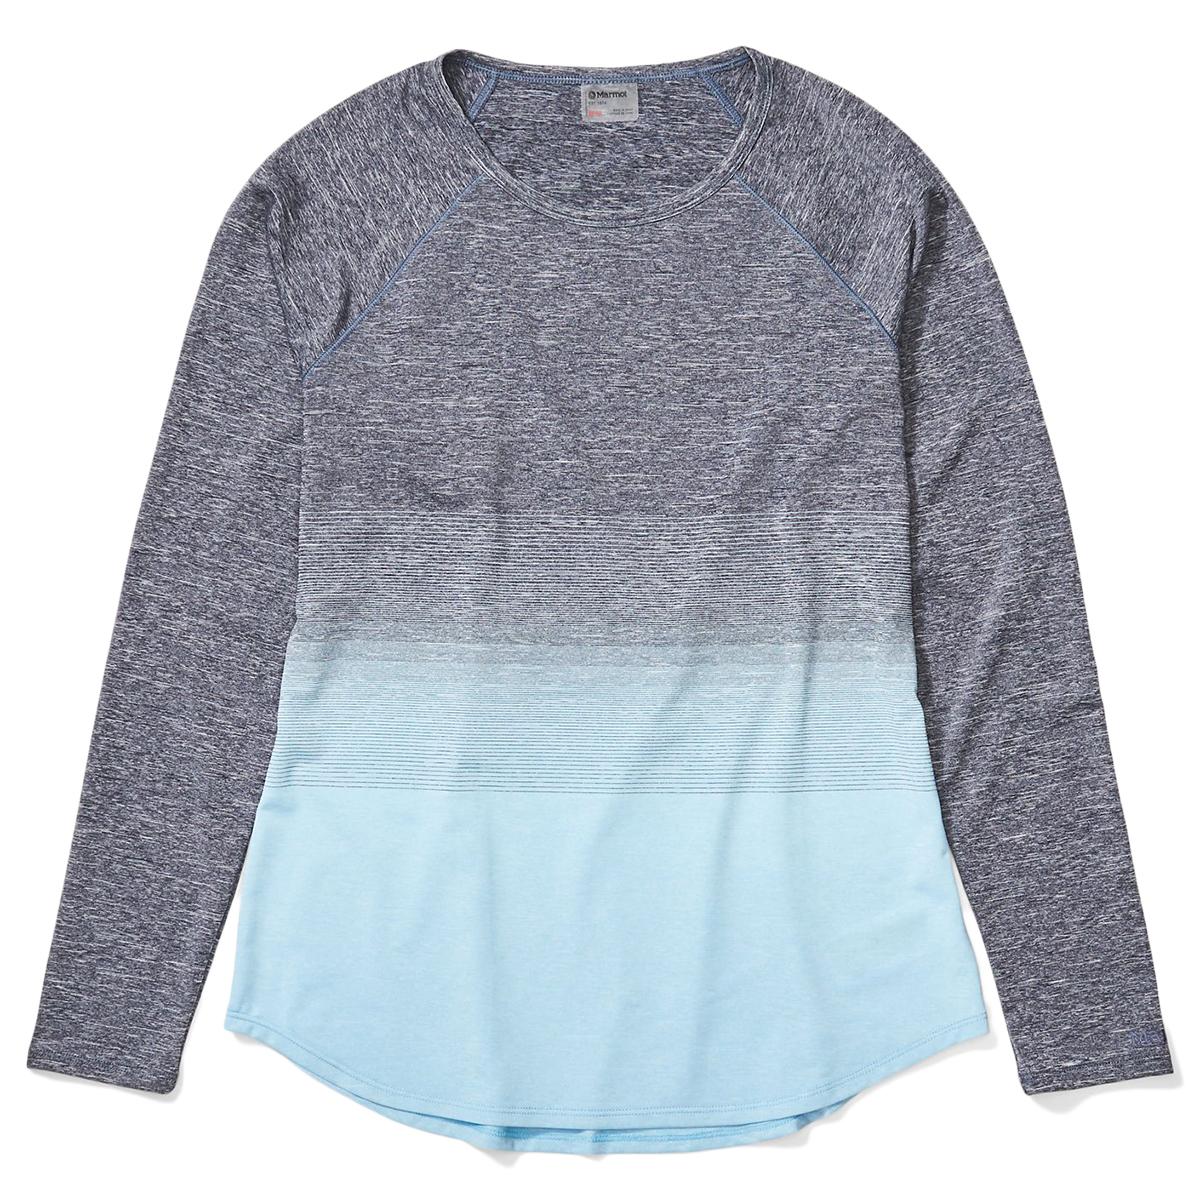 Marmot Women's Cabrillo Long-Sleeve Shirt - Blue, L